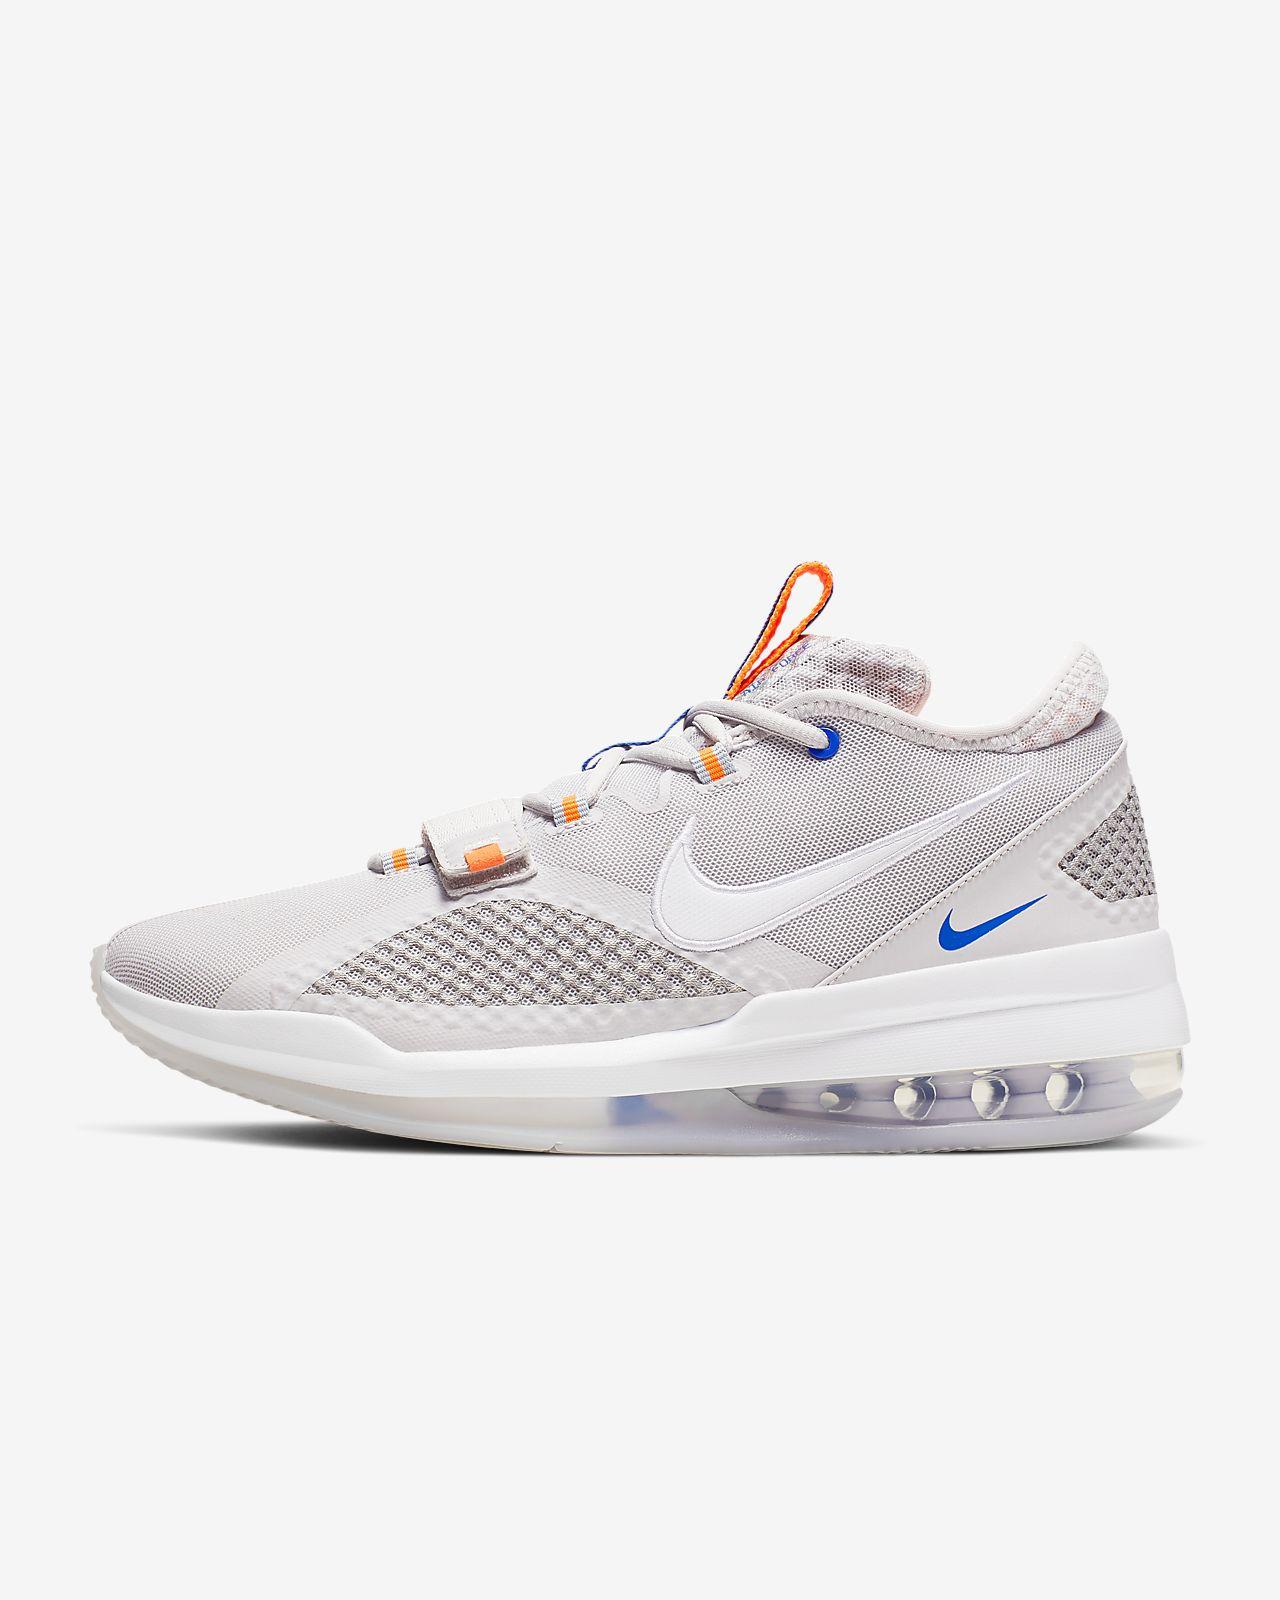 Calzado de básquetbol Nike Air Force Max Low